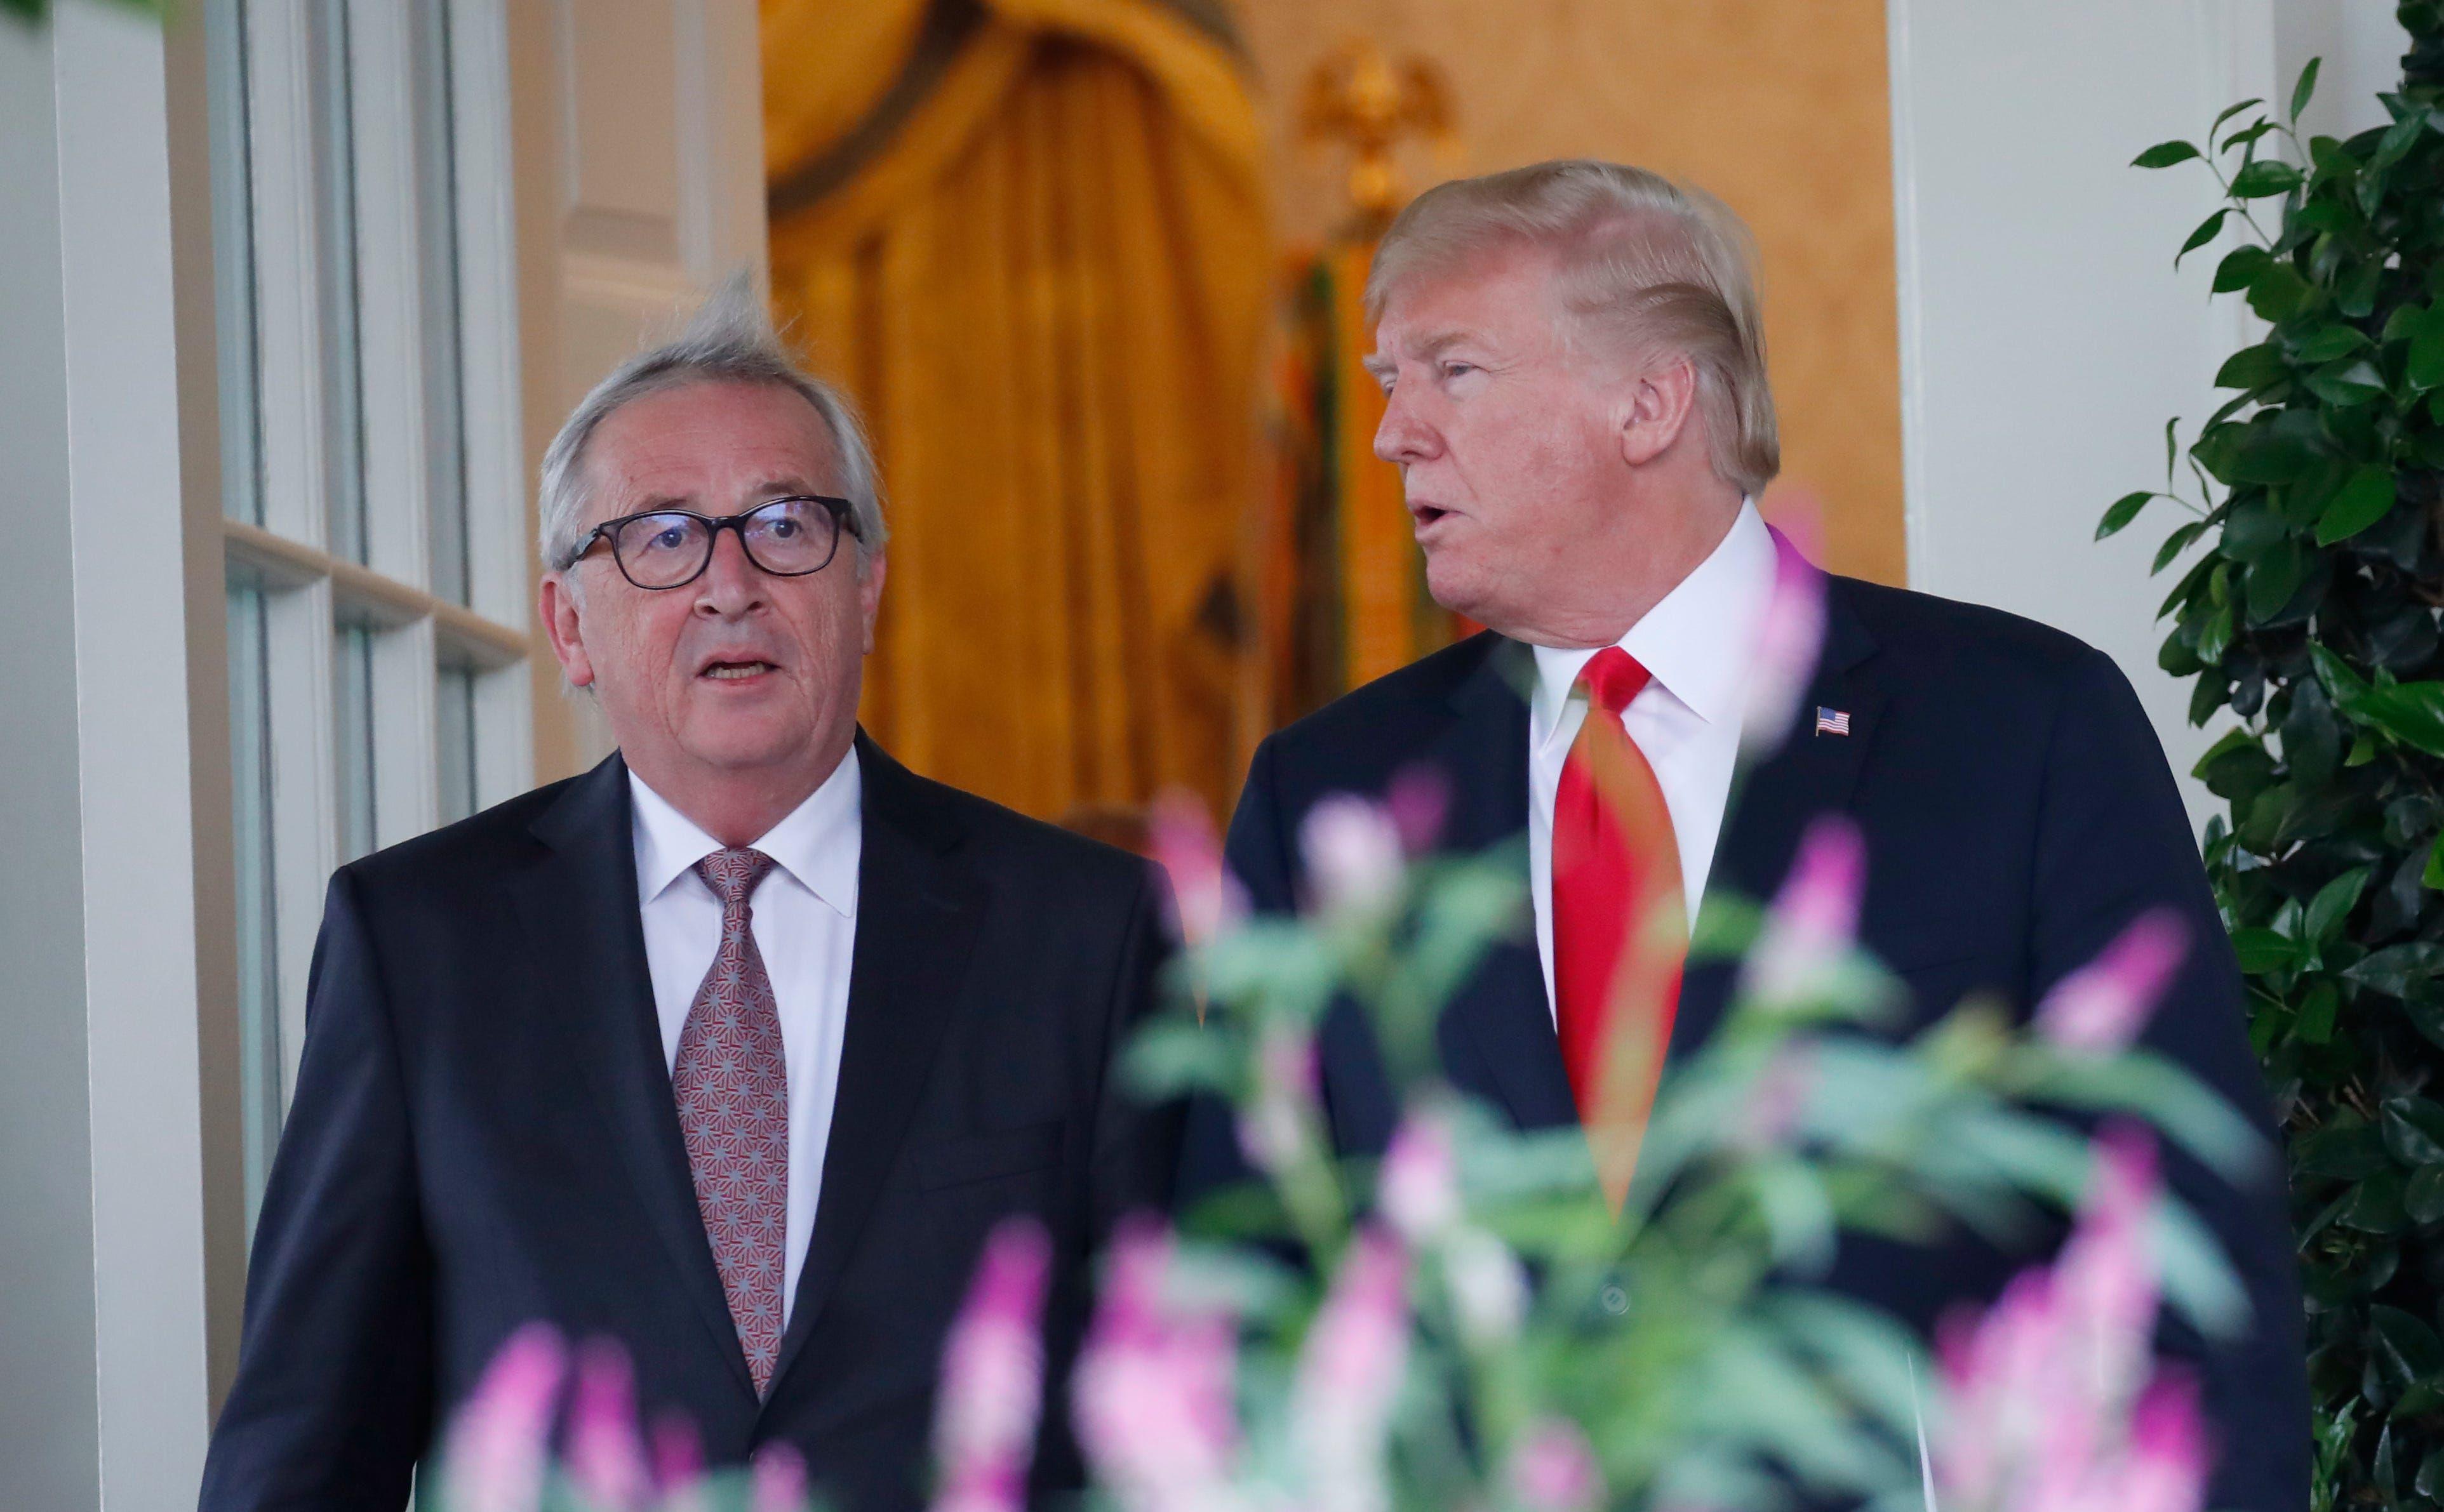 US proposing more tariffs on European goods as part of